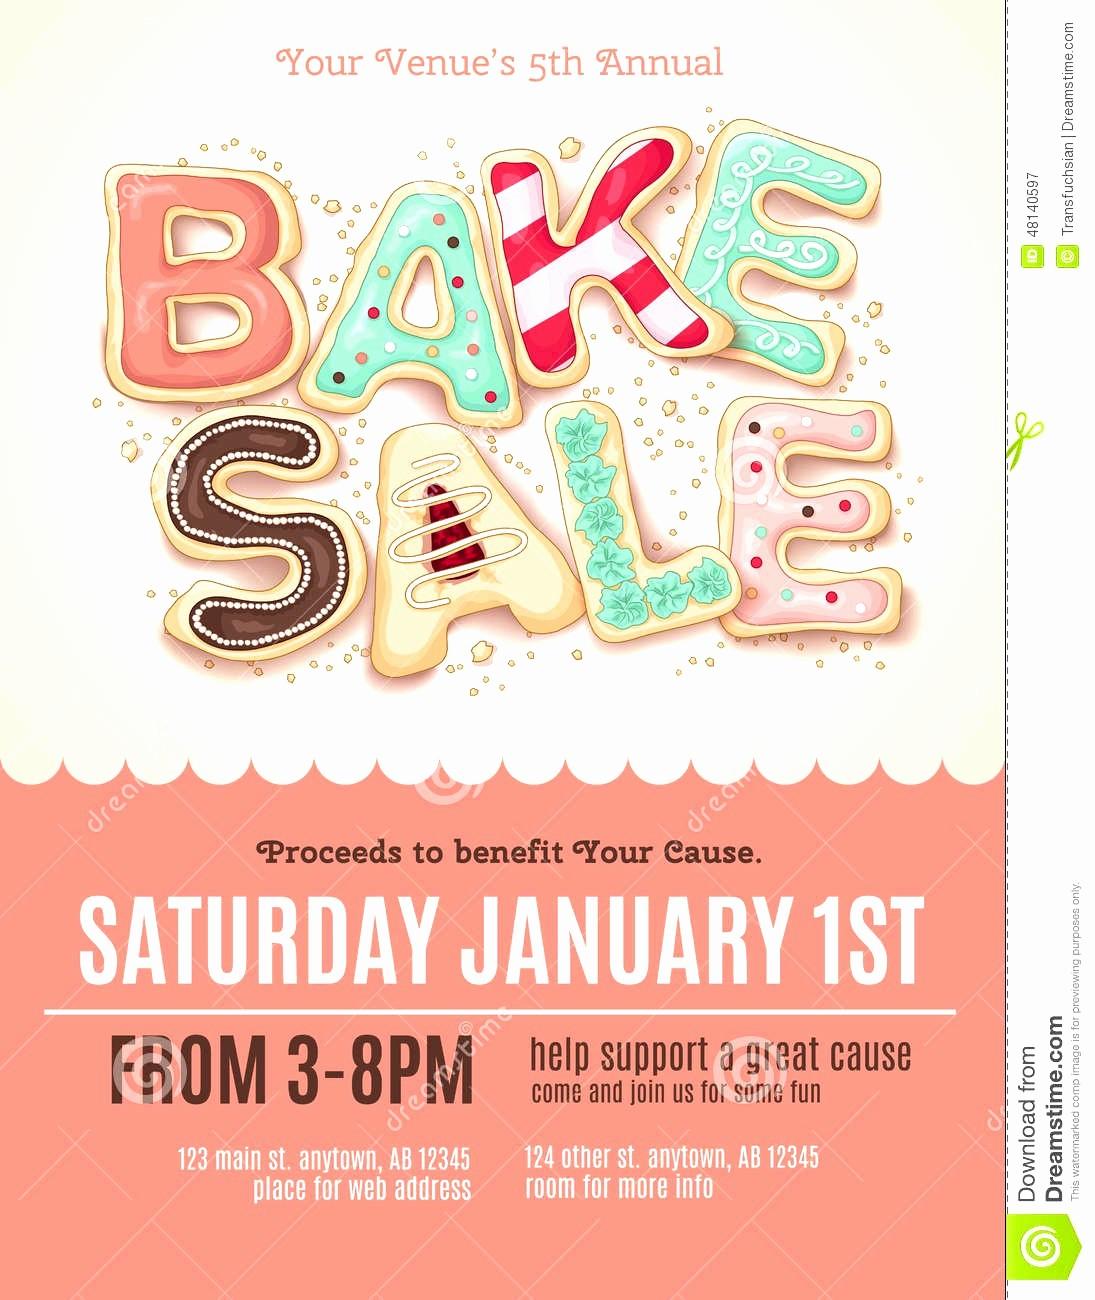 Bake Sale Flyer Template Microsoft Elegant Microsoft Word Flyer Template Free Brochure for Design